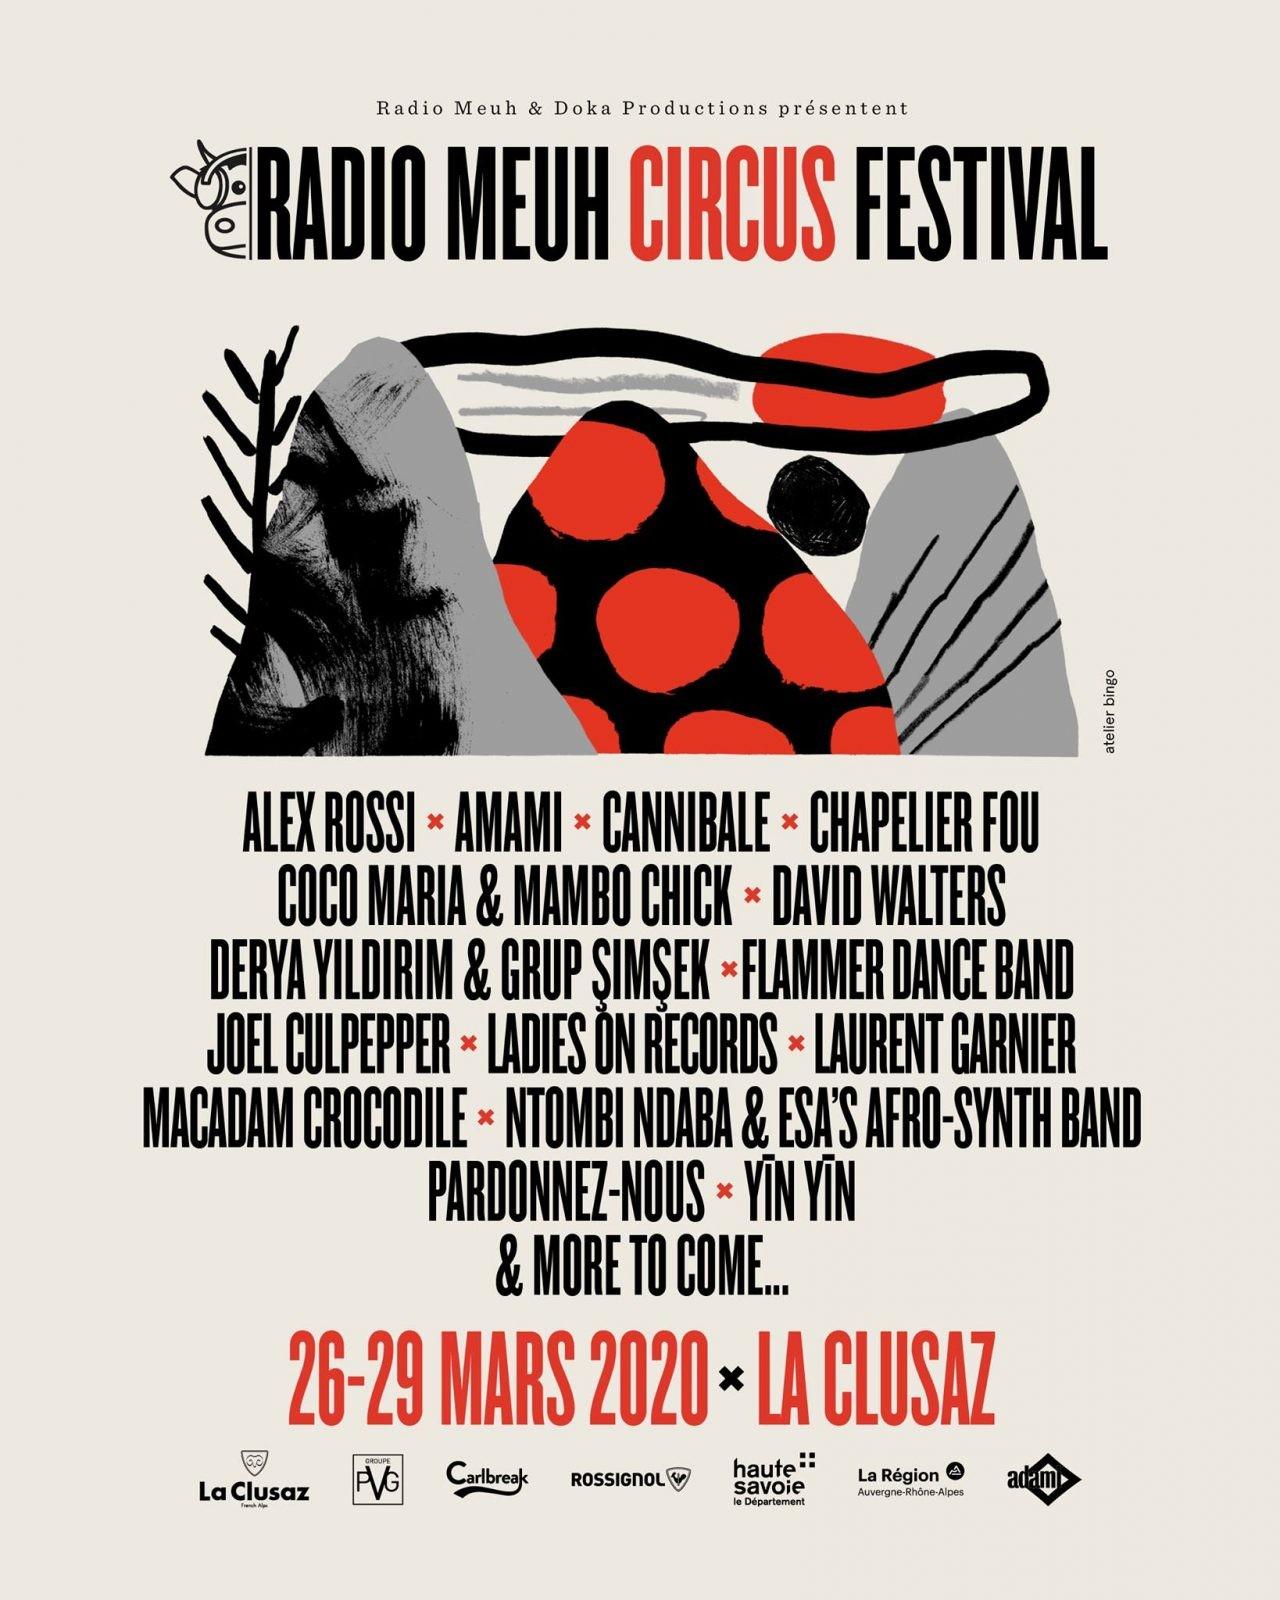 Affiche du Radio Meuh Circus Festival 2020